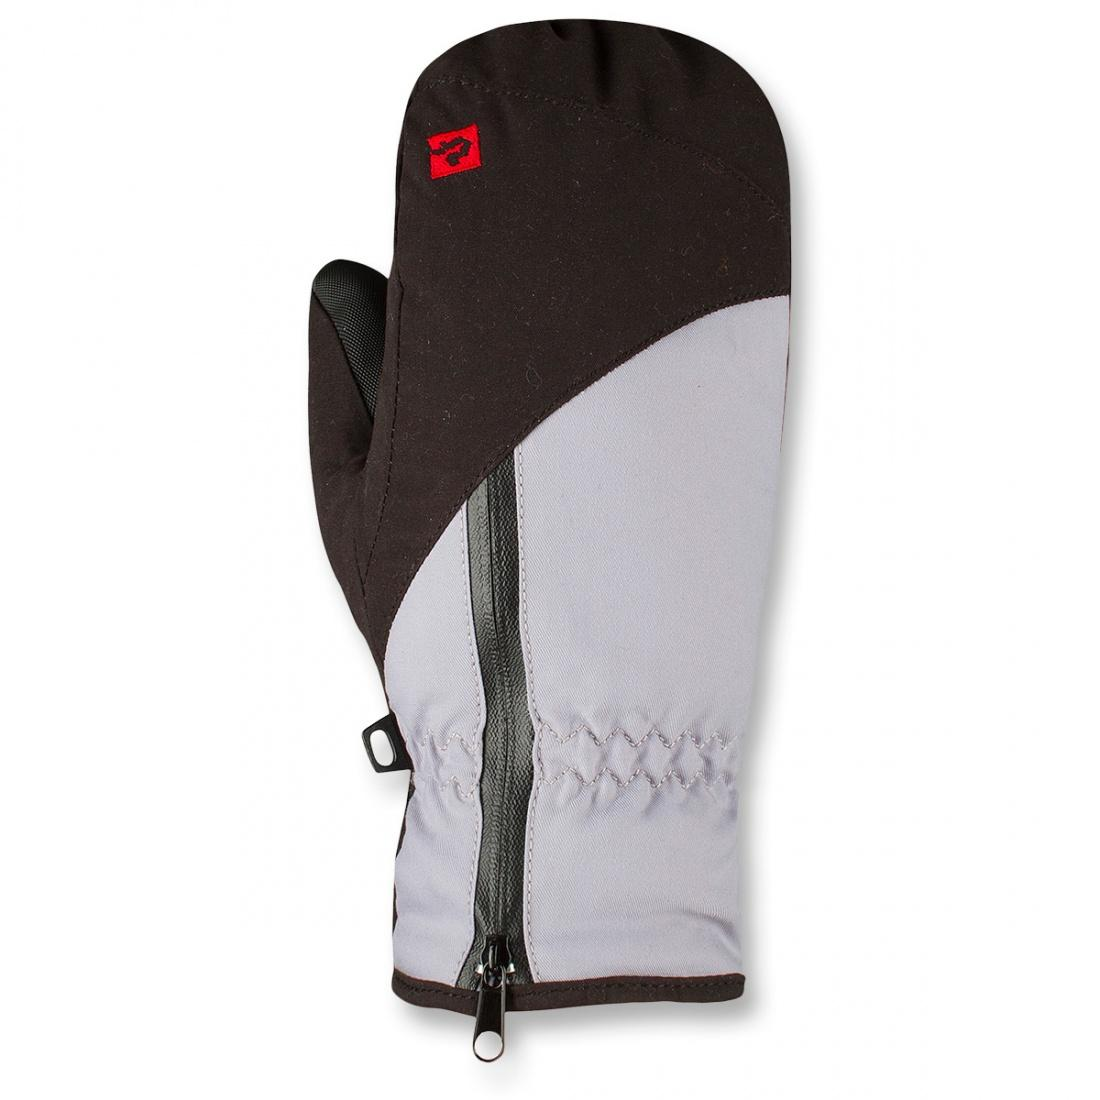 Рукавицы утепленные Traverse II ПодростковыеВарежки<br><br> Прогулочные утепленные рукавицы с ярким дизайном.<br><br><br><br><br><br>Материал – 50% Polyester, 50% Nylon, 156 g/sqm.<br>Усиление – 80% Polyvinyl Chloride, 20% P...<br><br>Цвет: Синий<br>Размер: M